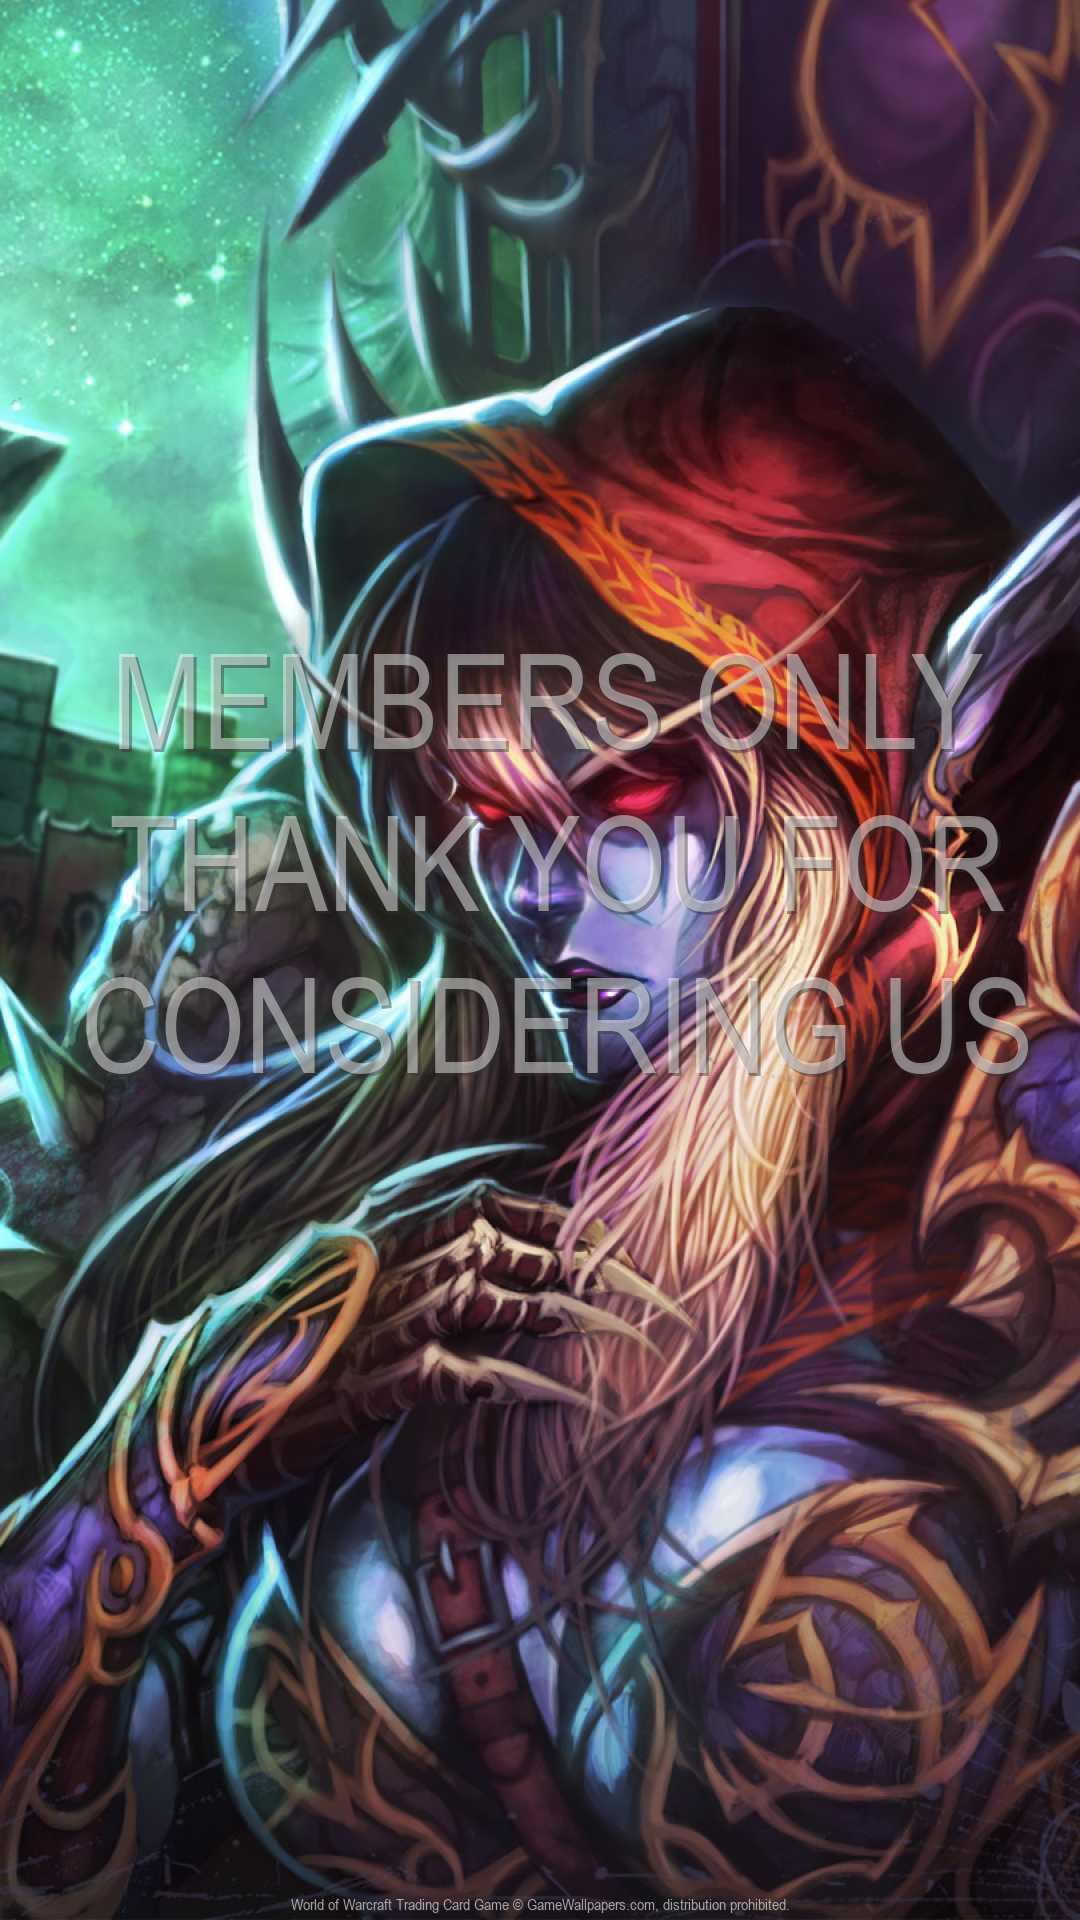 World of Warcraft: Trading Card Game 1080p Vertical Handy Hintergrundbild 51